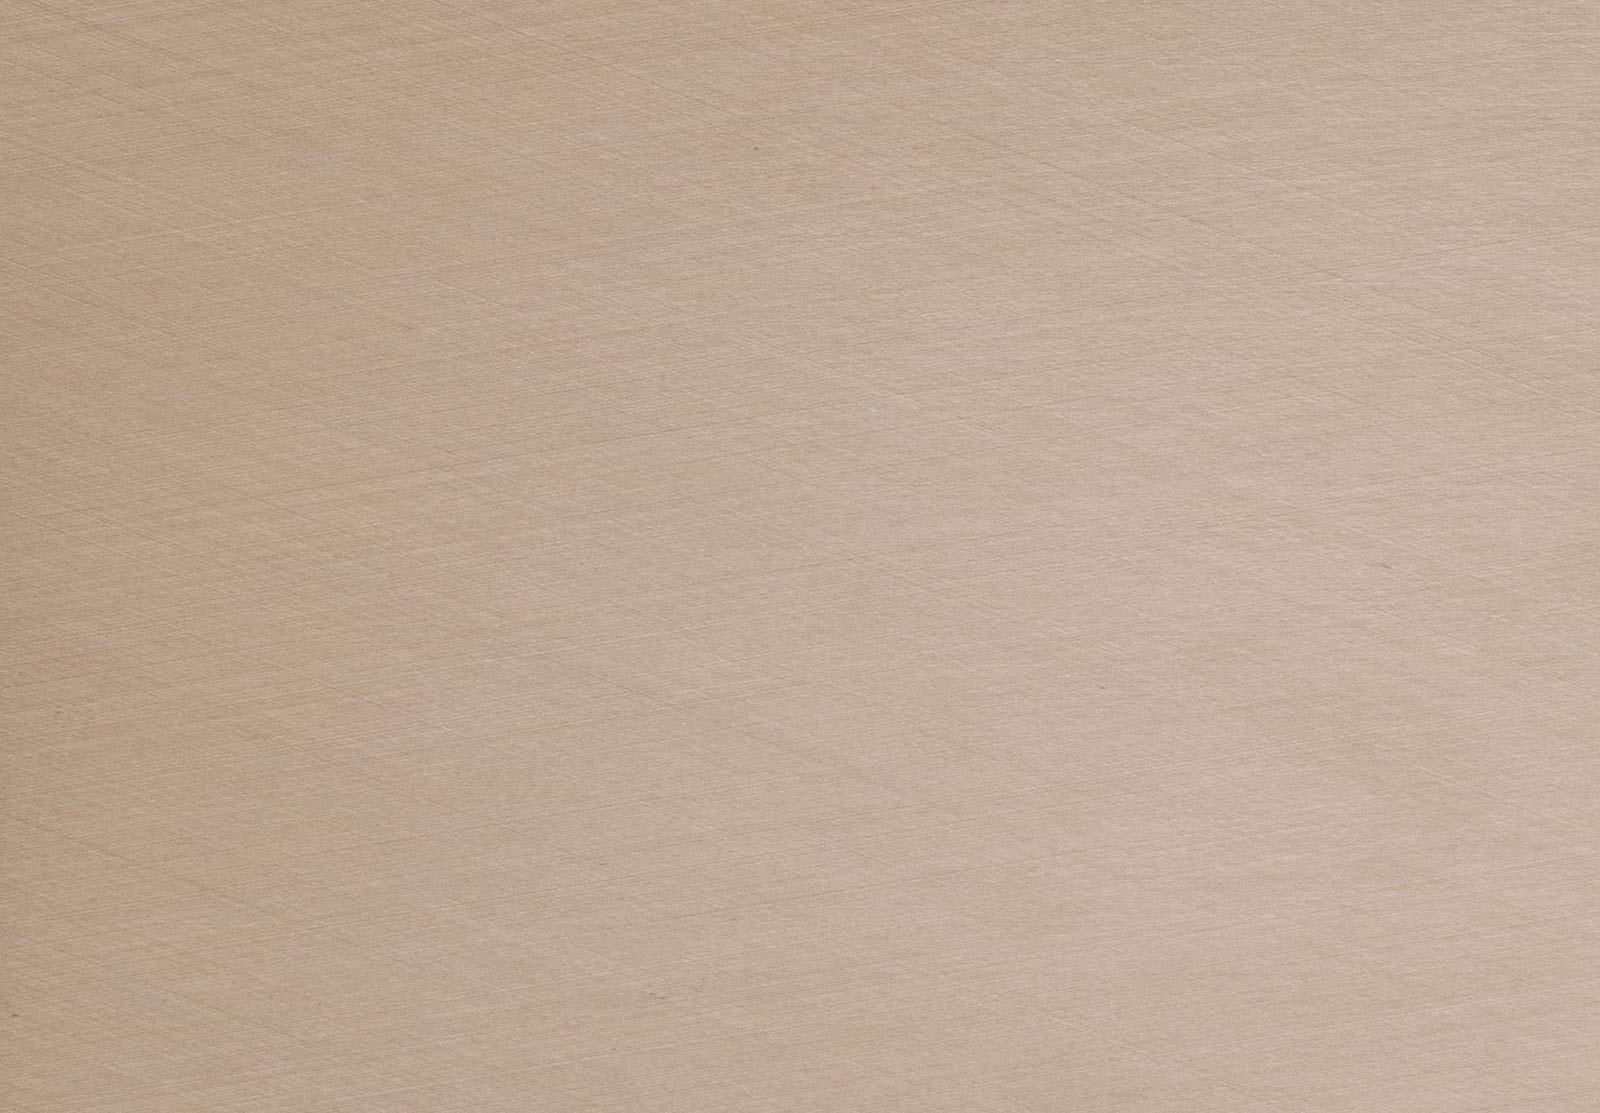 Pannelli alfawood - Tawny Rays 3010